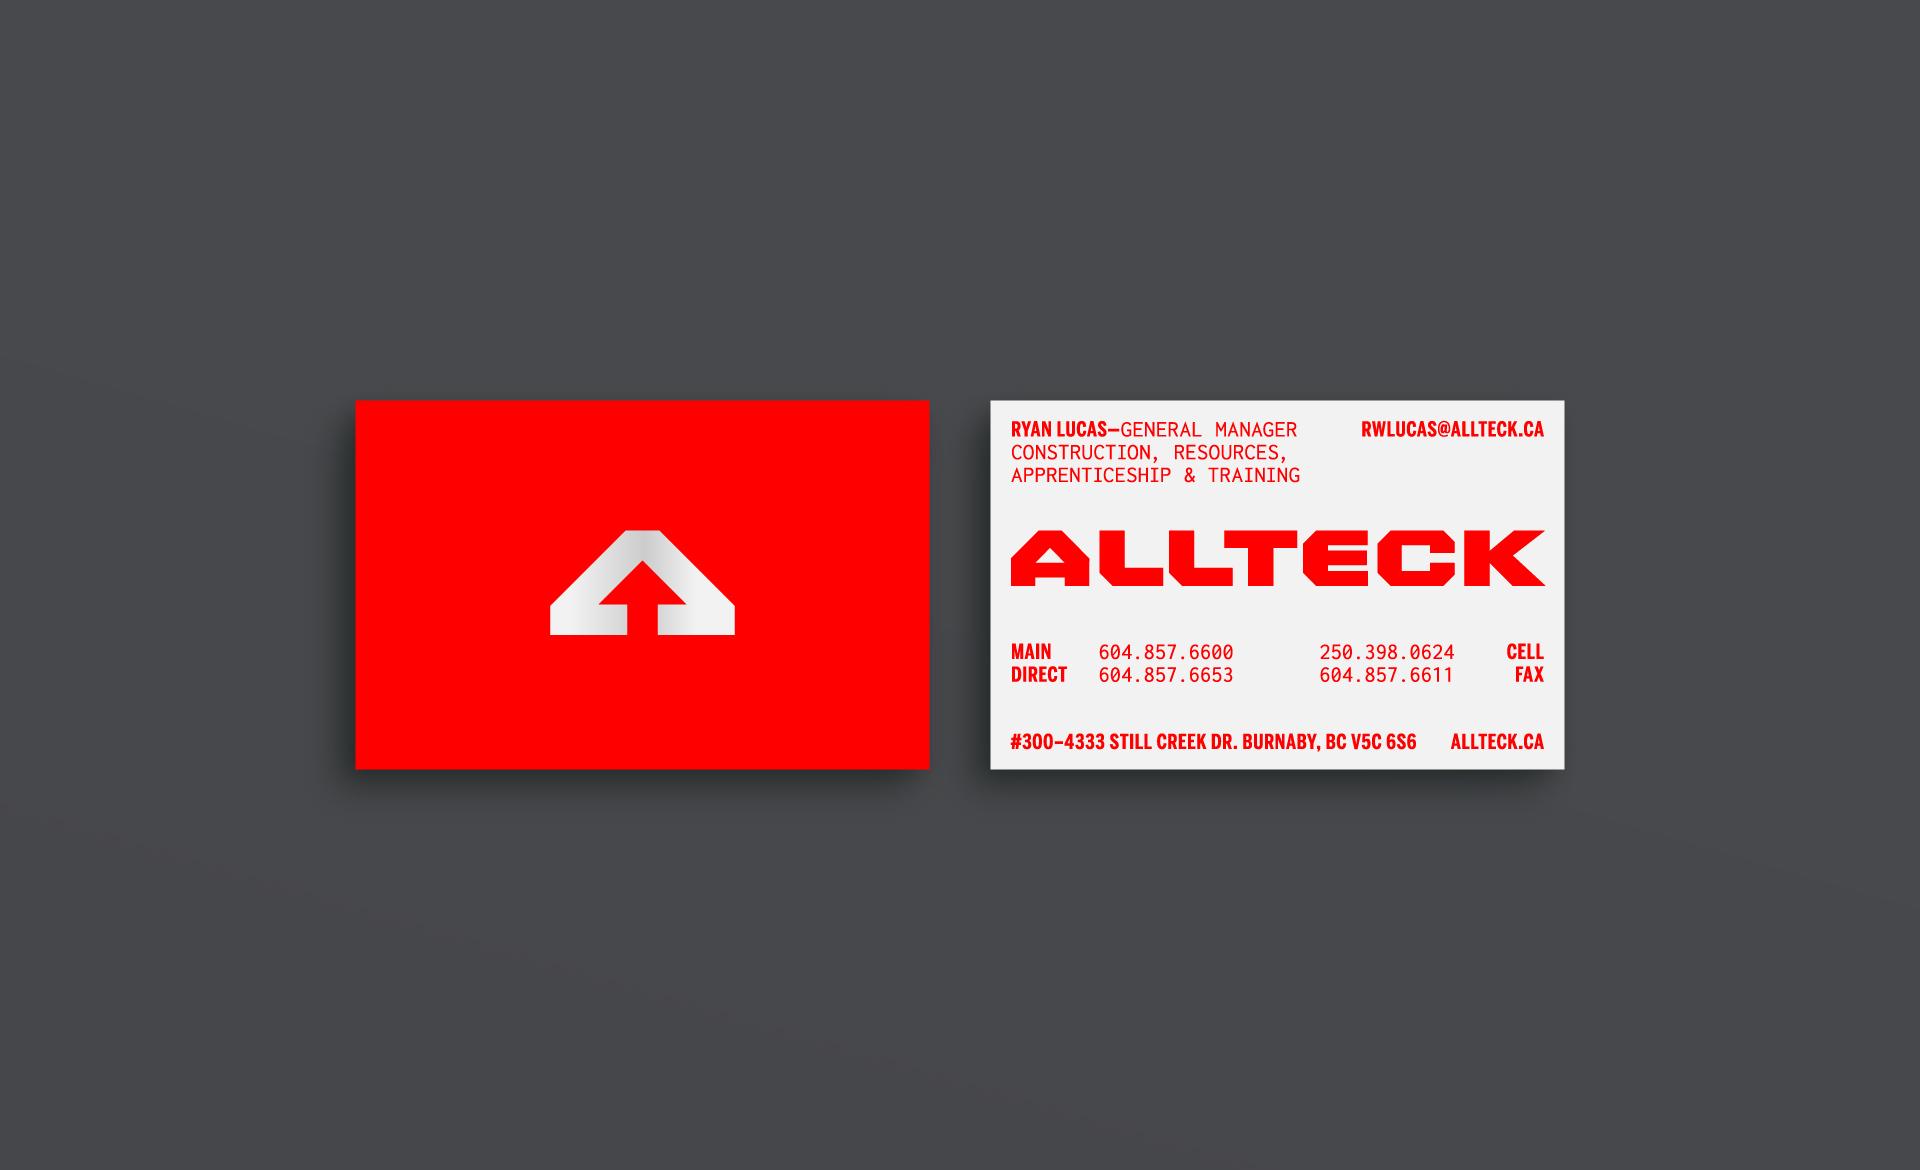 Allteck_4